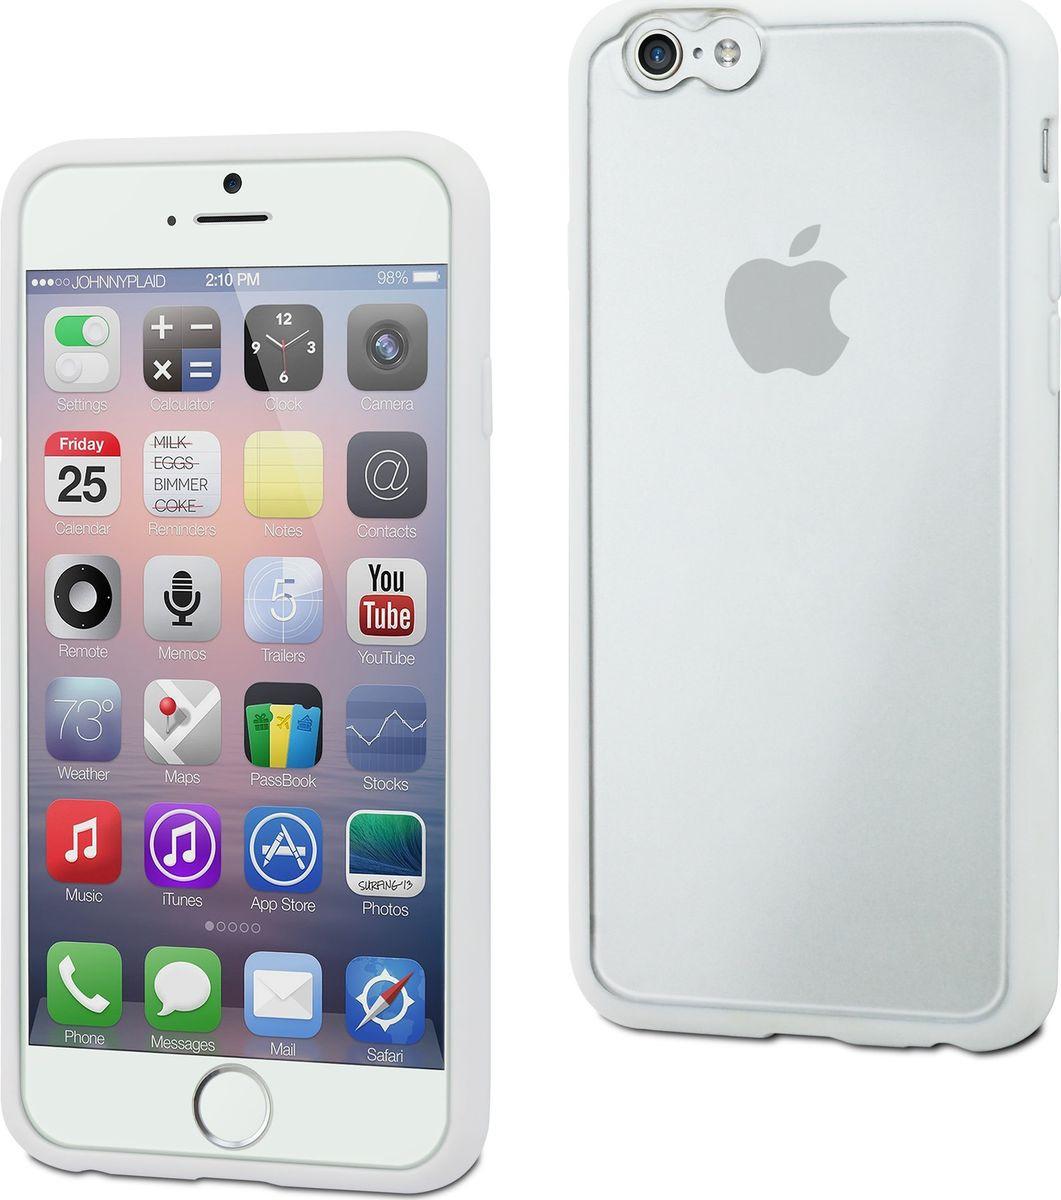 Чехол для сотового телефона Muvit MyFrame Case для Apple iPhone 6/6S Plus, MUBMC0104, белый чехол для сотового телефона uag monarch series case для iphone 6 plus 6s plus 7 plus 8 plus красный